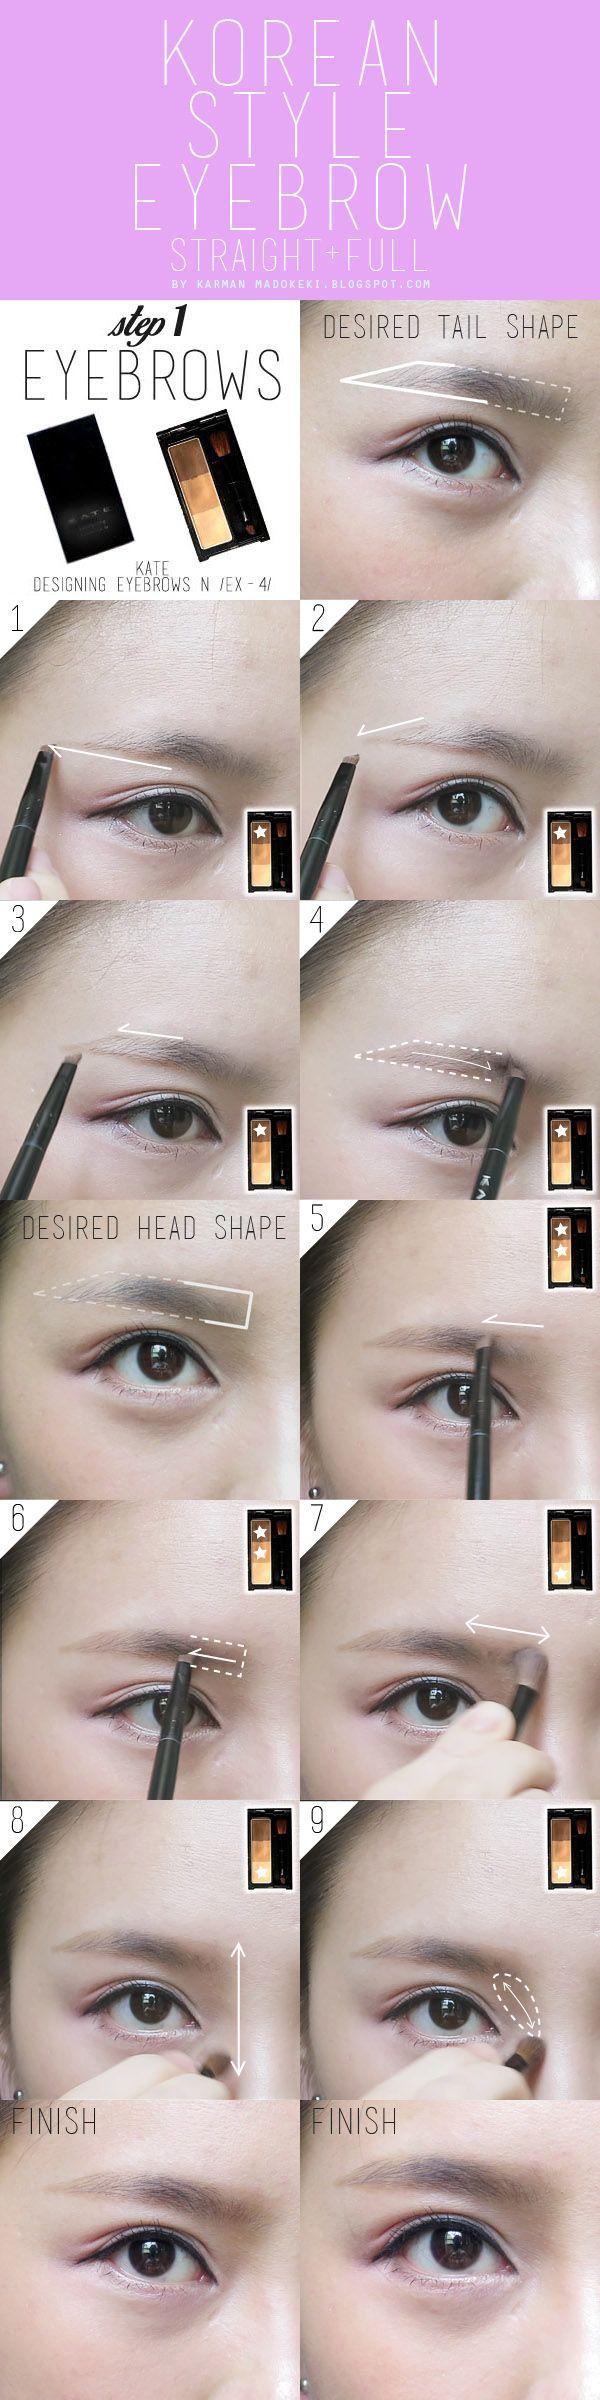 korean style eyebrow tutorial pictorial